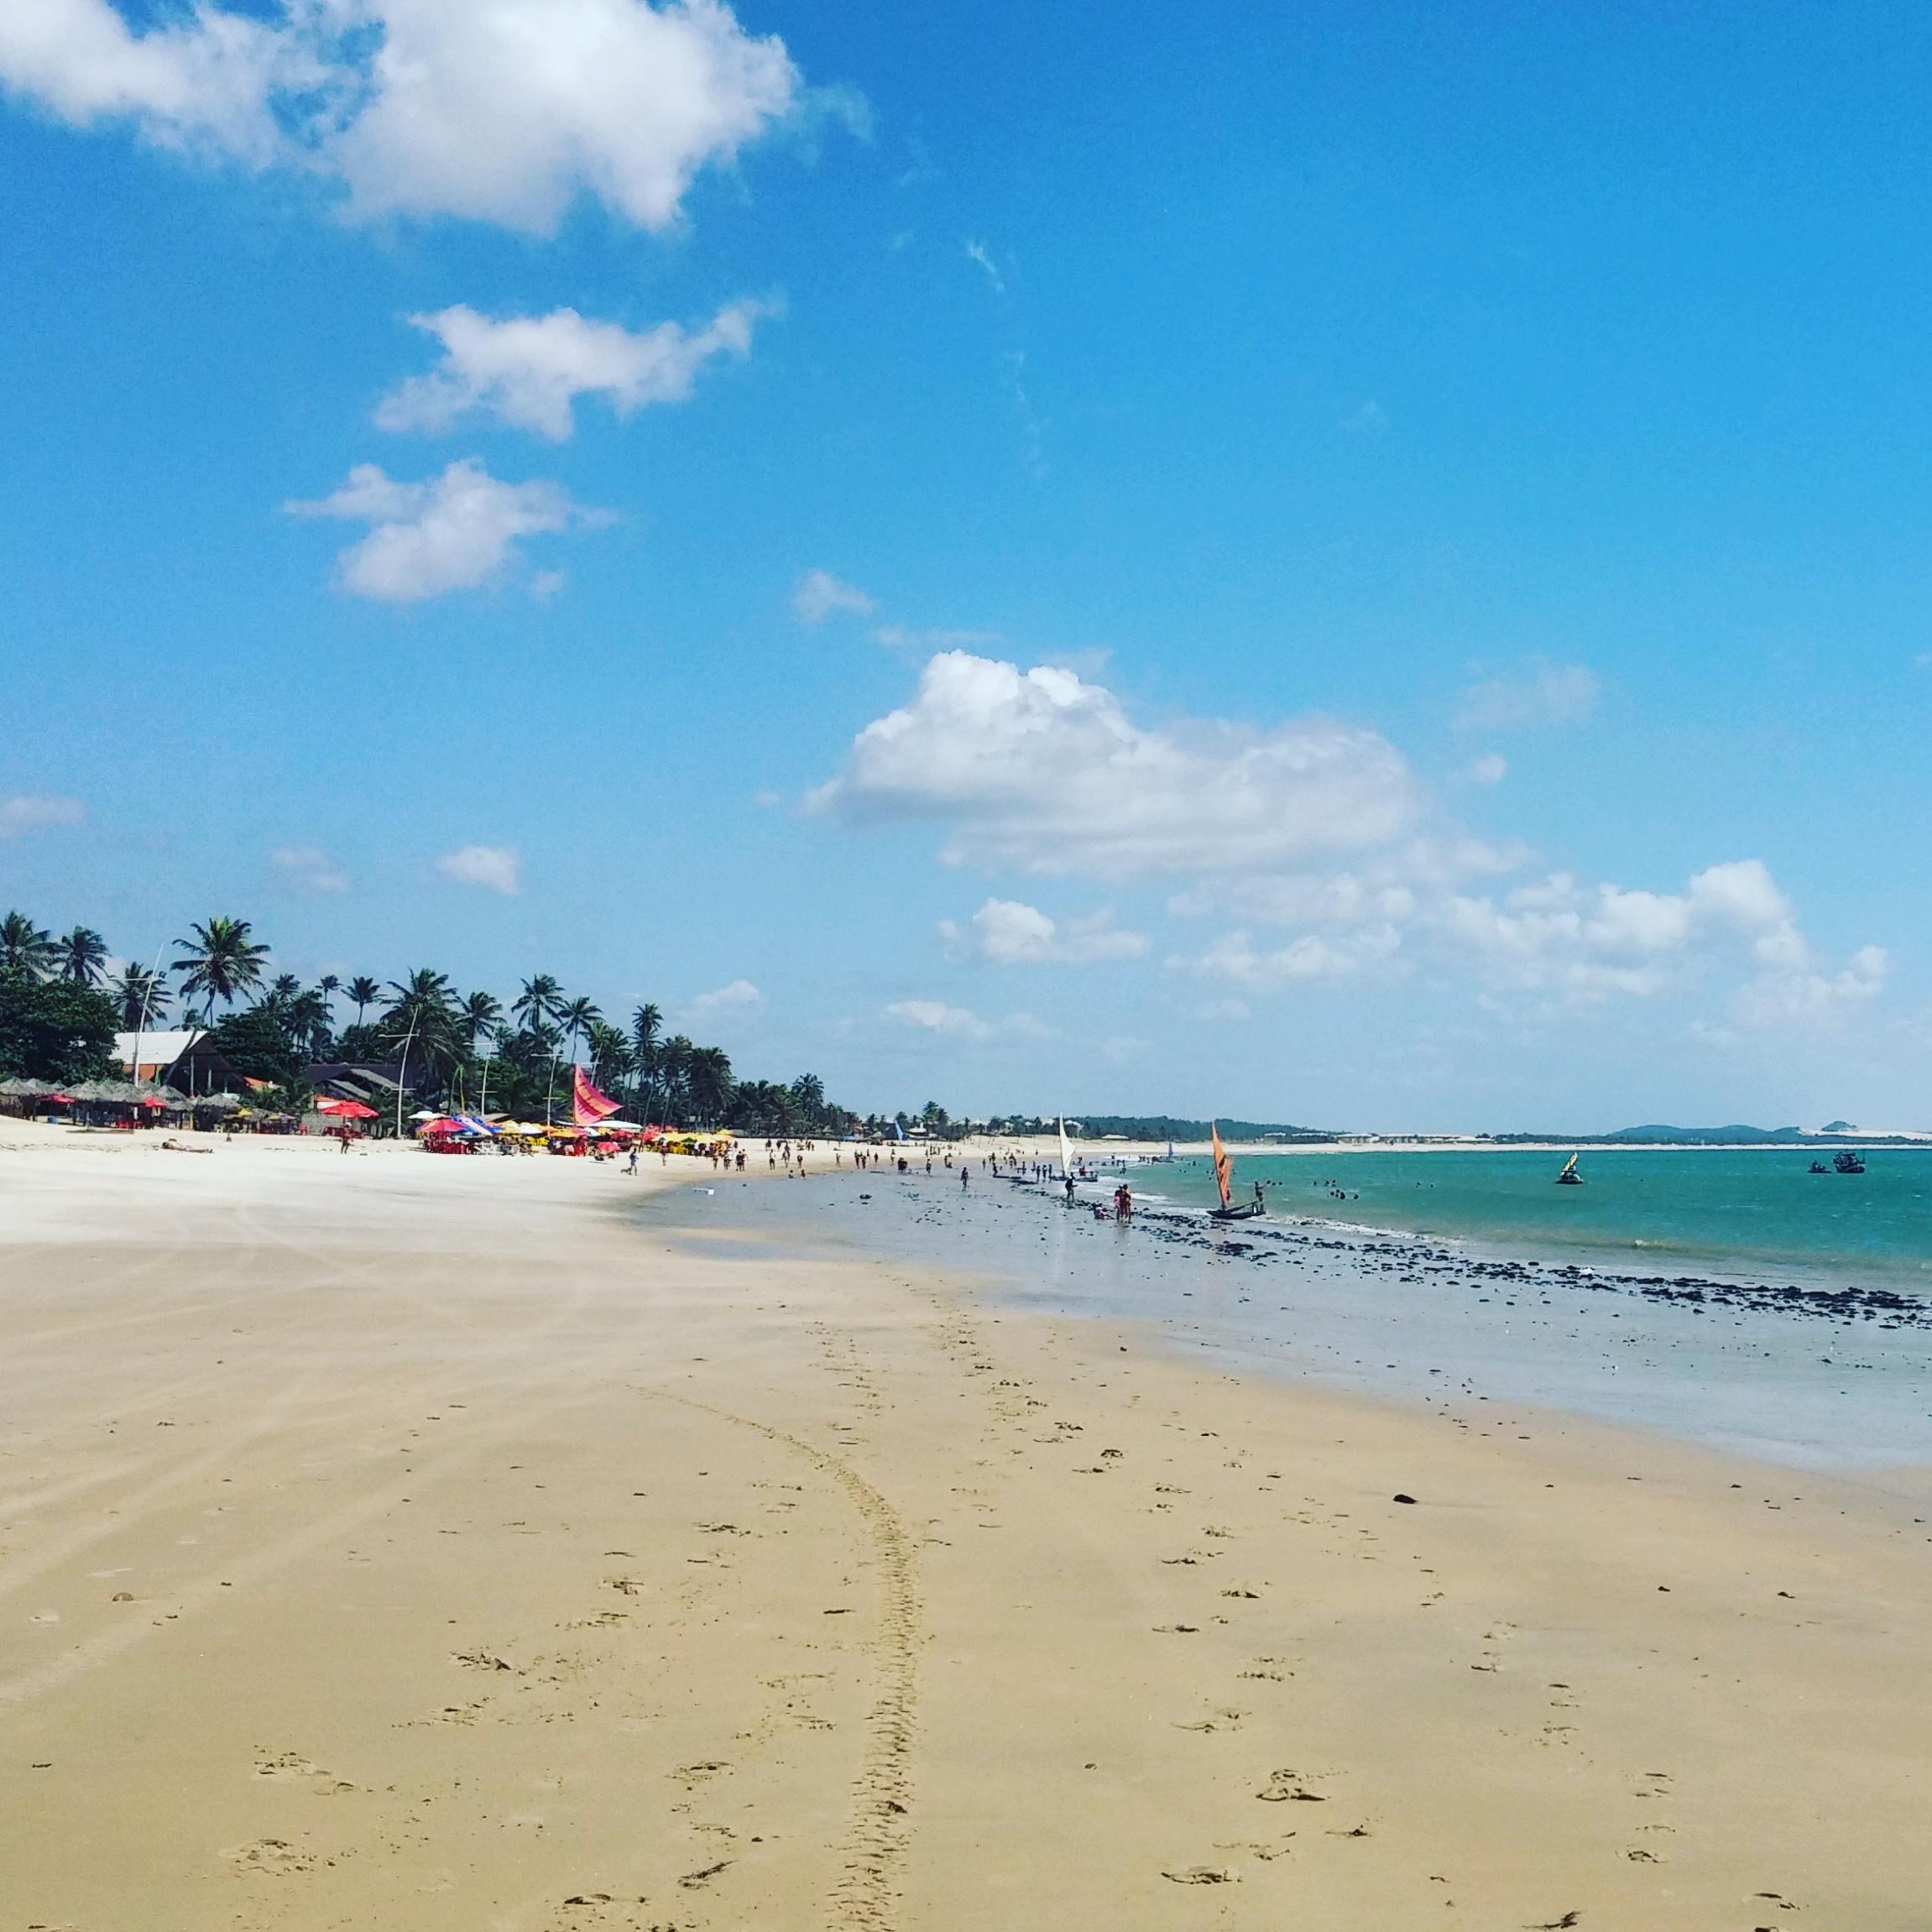 Praia do Cumbuco, Fortaleza - CE, by Luciana de Paula, 2016